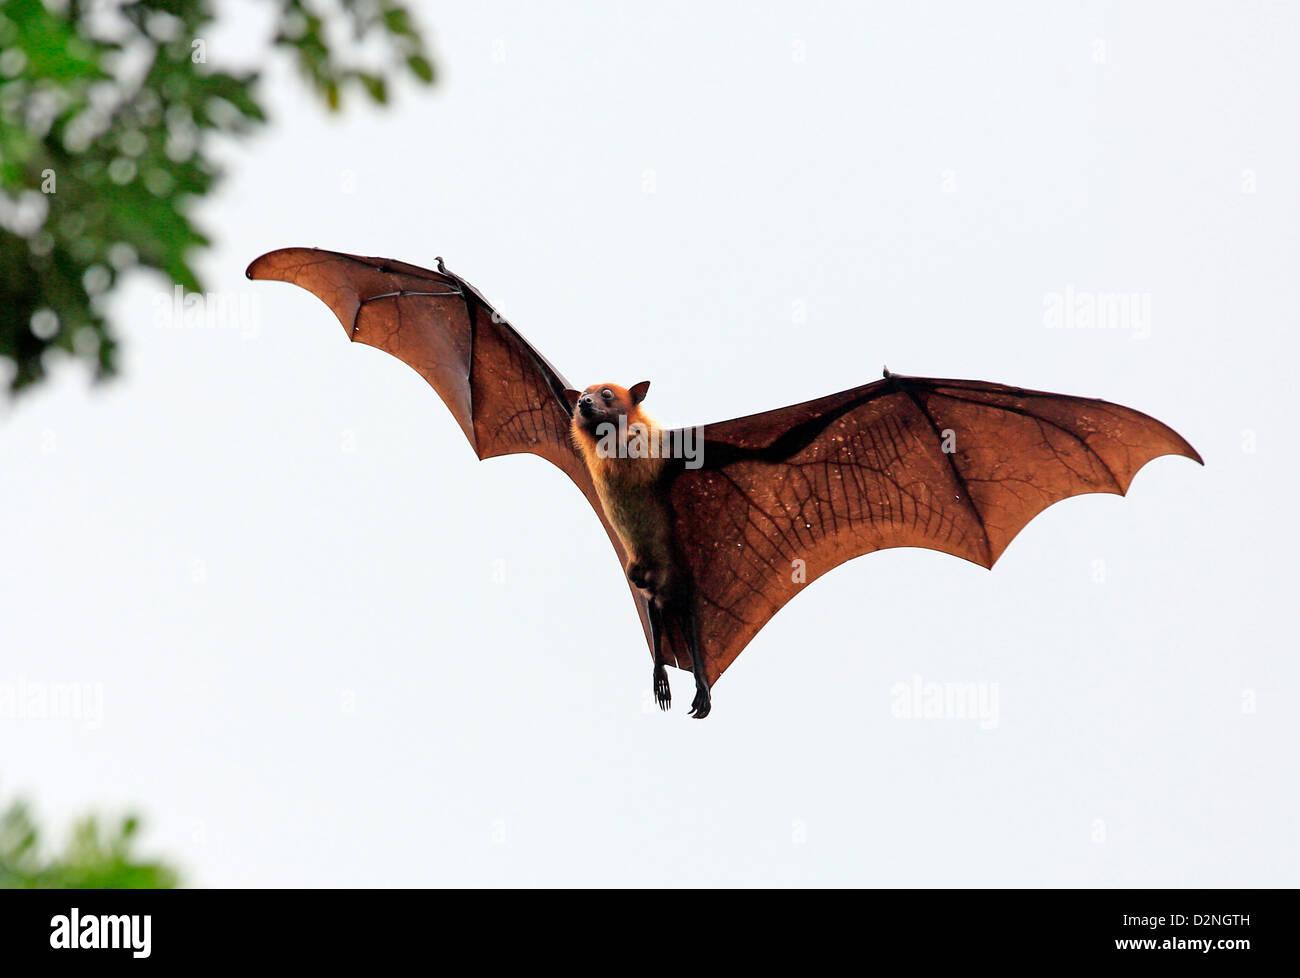 Fruit bat (flying fox) in Tissamaharama, Sri Lanka. Stock Photo